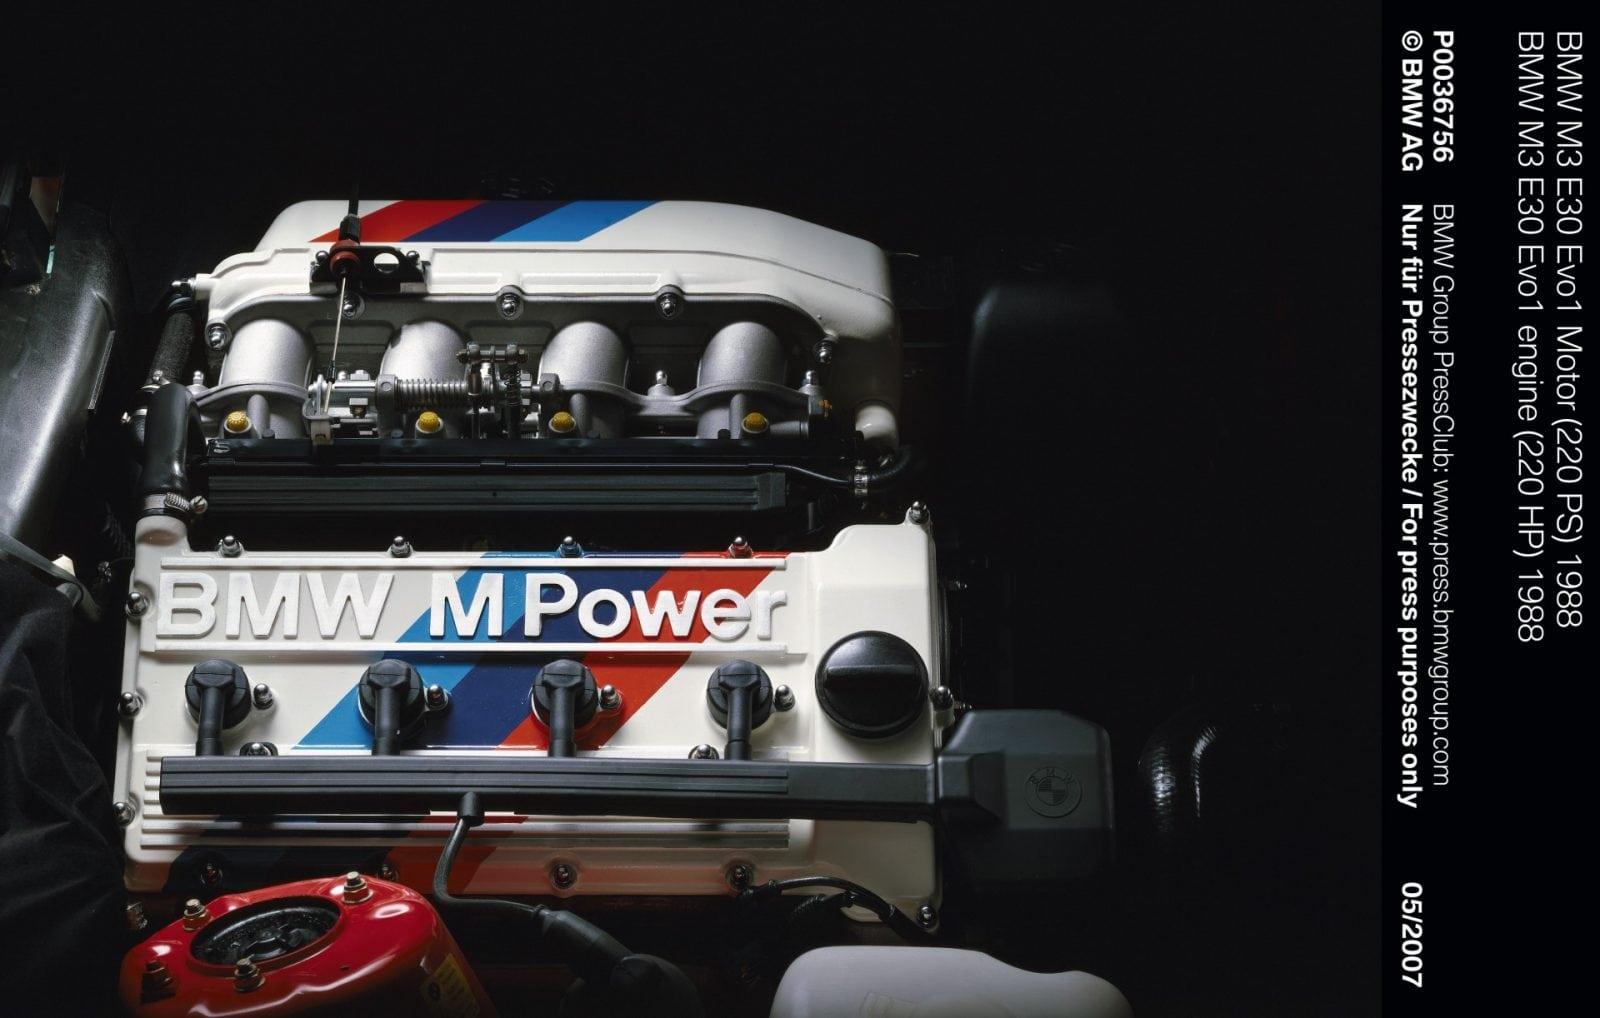 BMW M3 E30 Evo1 engine (220 HP) 1988